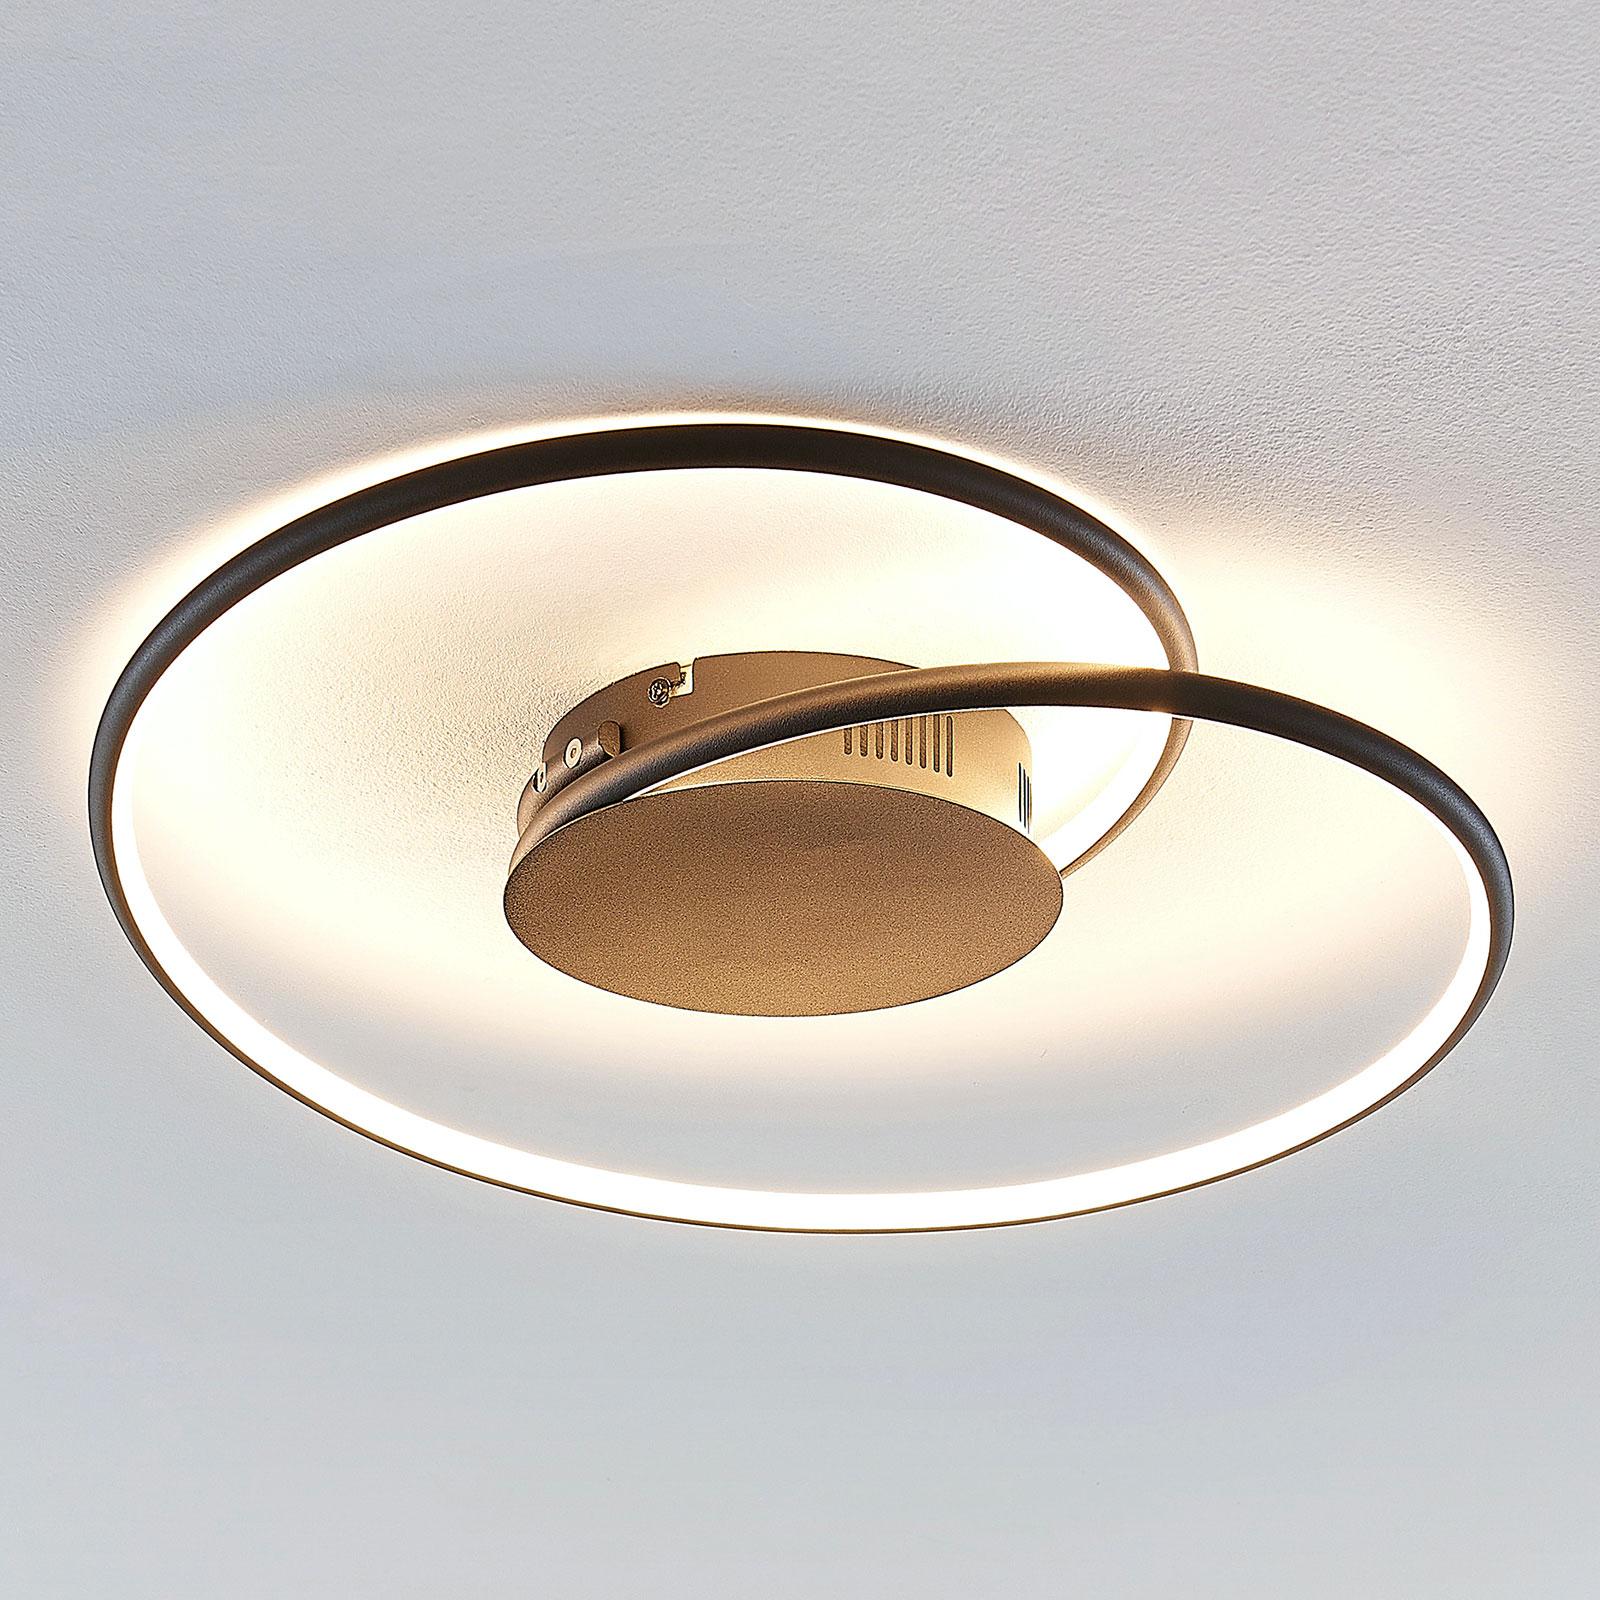 Lindby Joline LED-kattovalaisin, musta, 45 cm